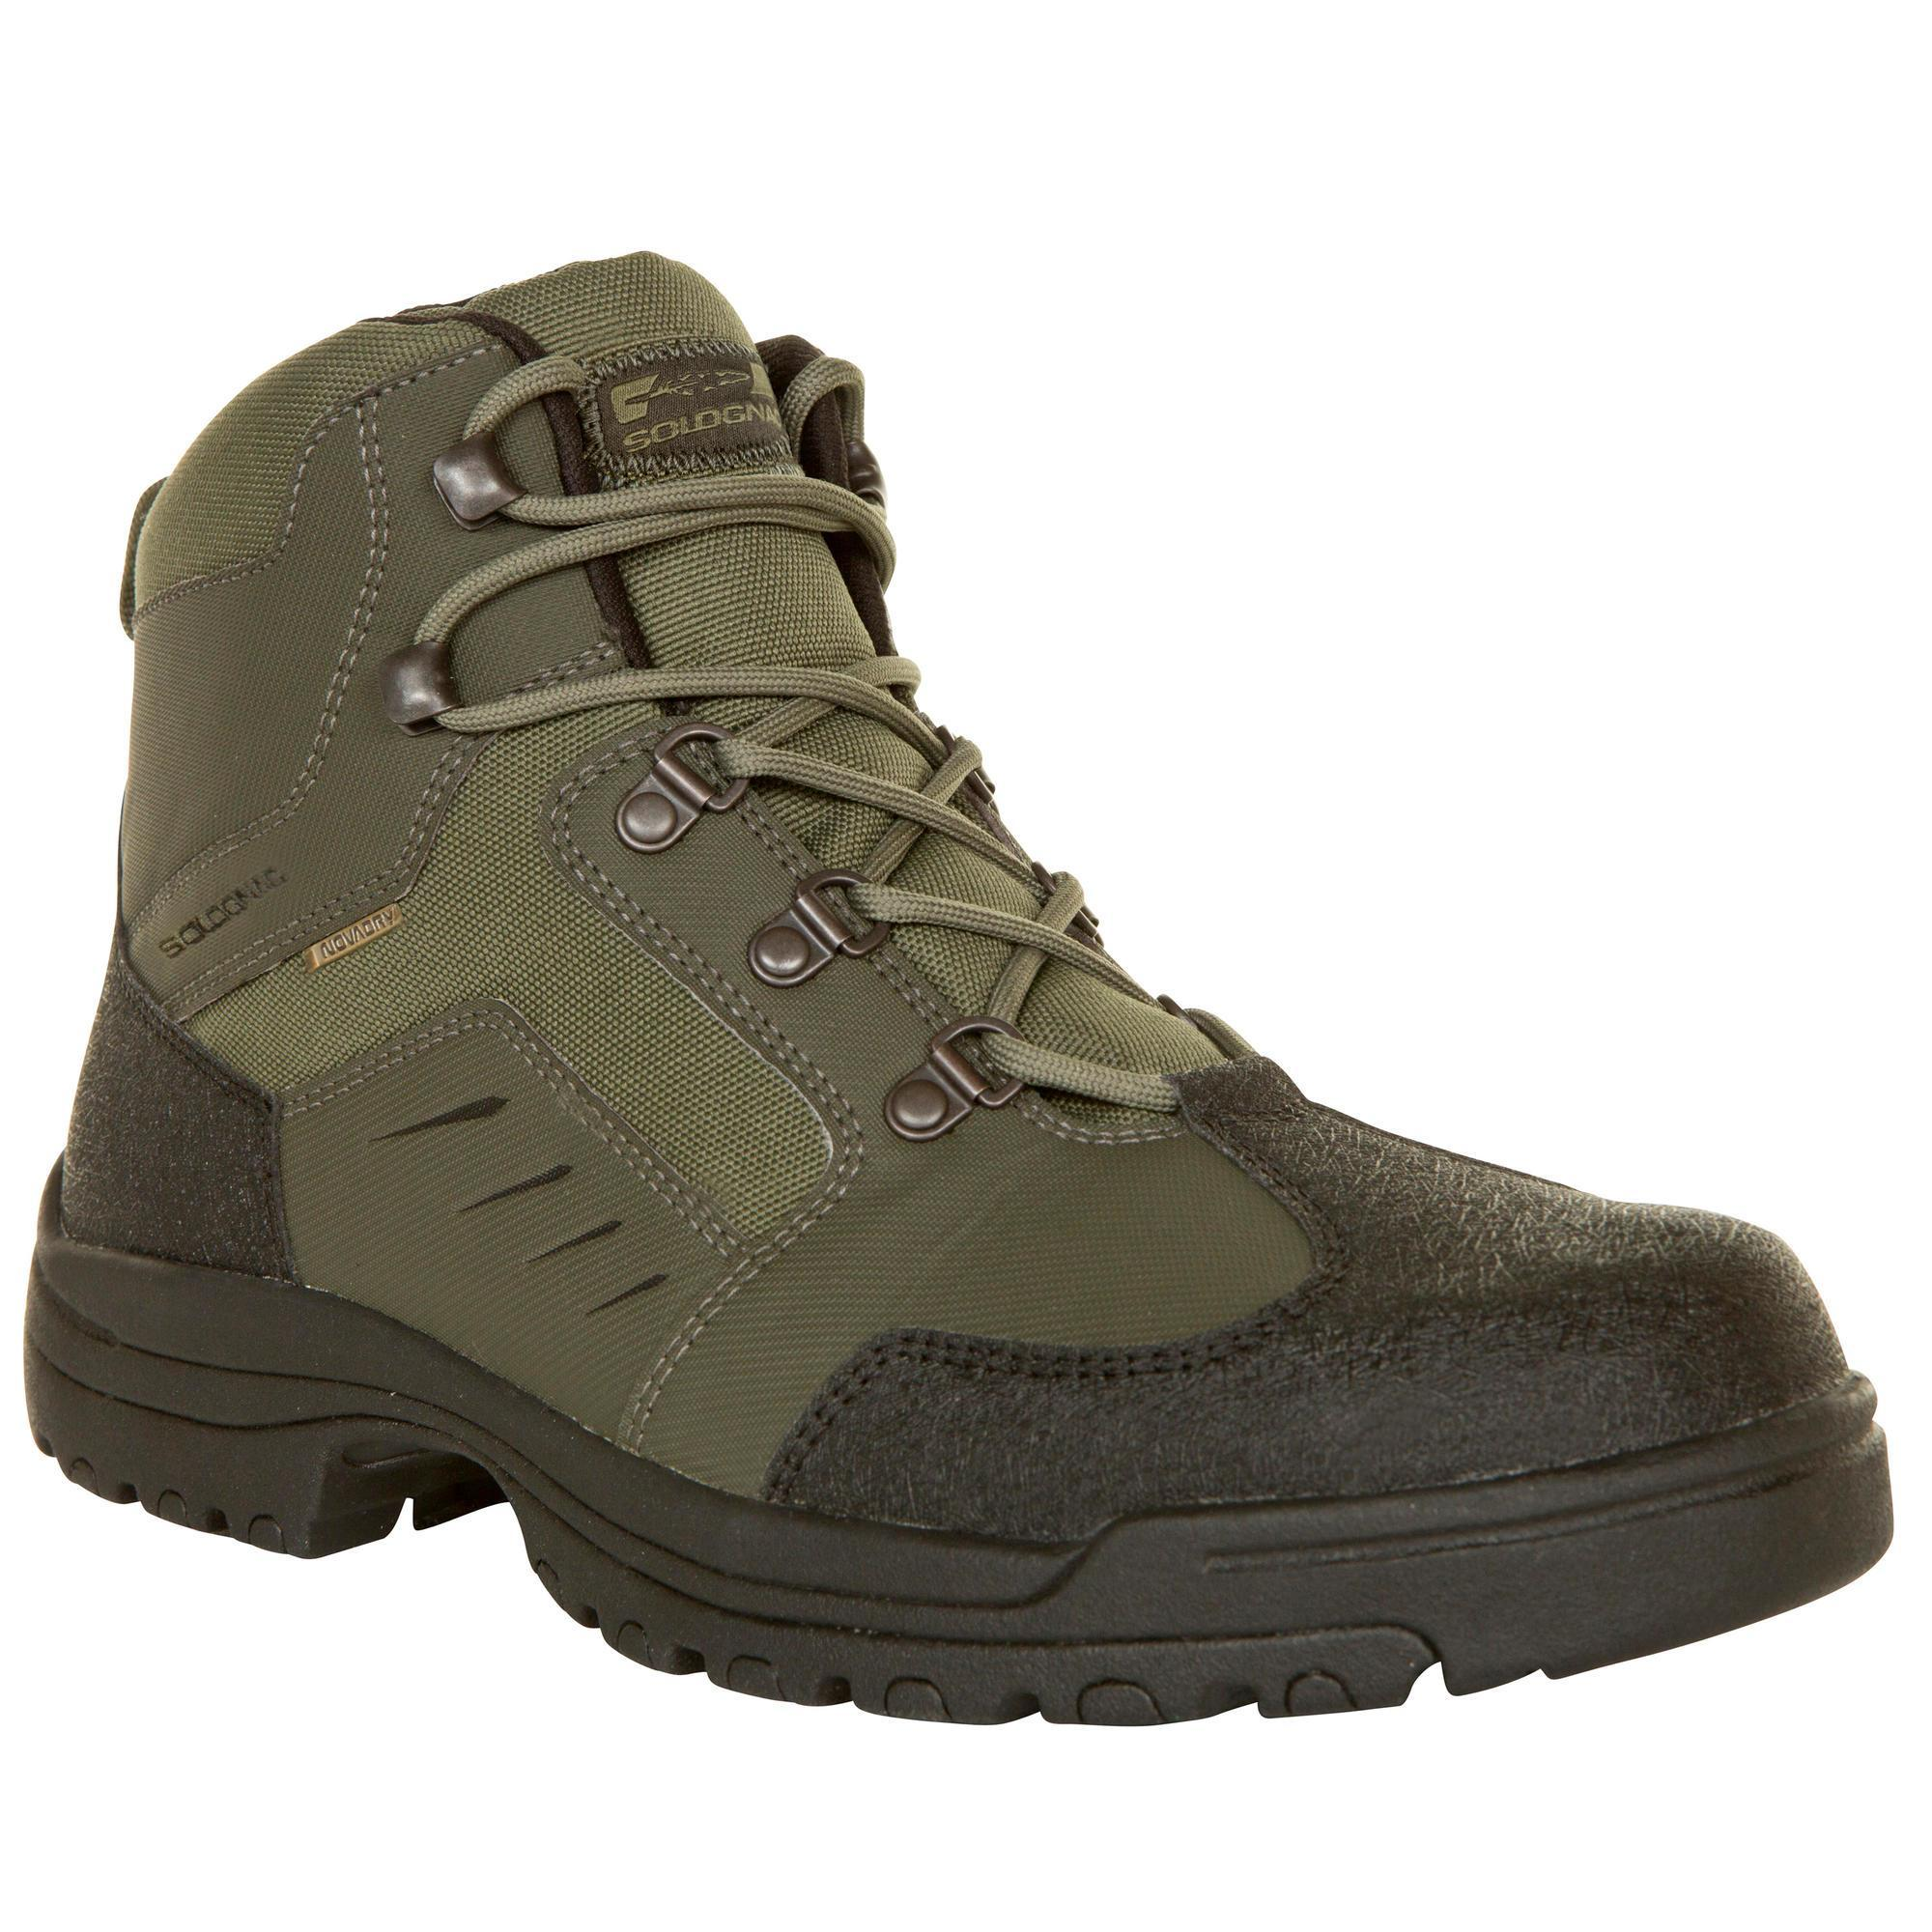 Jagdstiefel wasserdicht Crosshunt 100 grün | Schuhe > Boots > Stiefel | Solognac